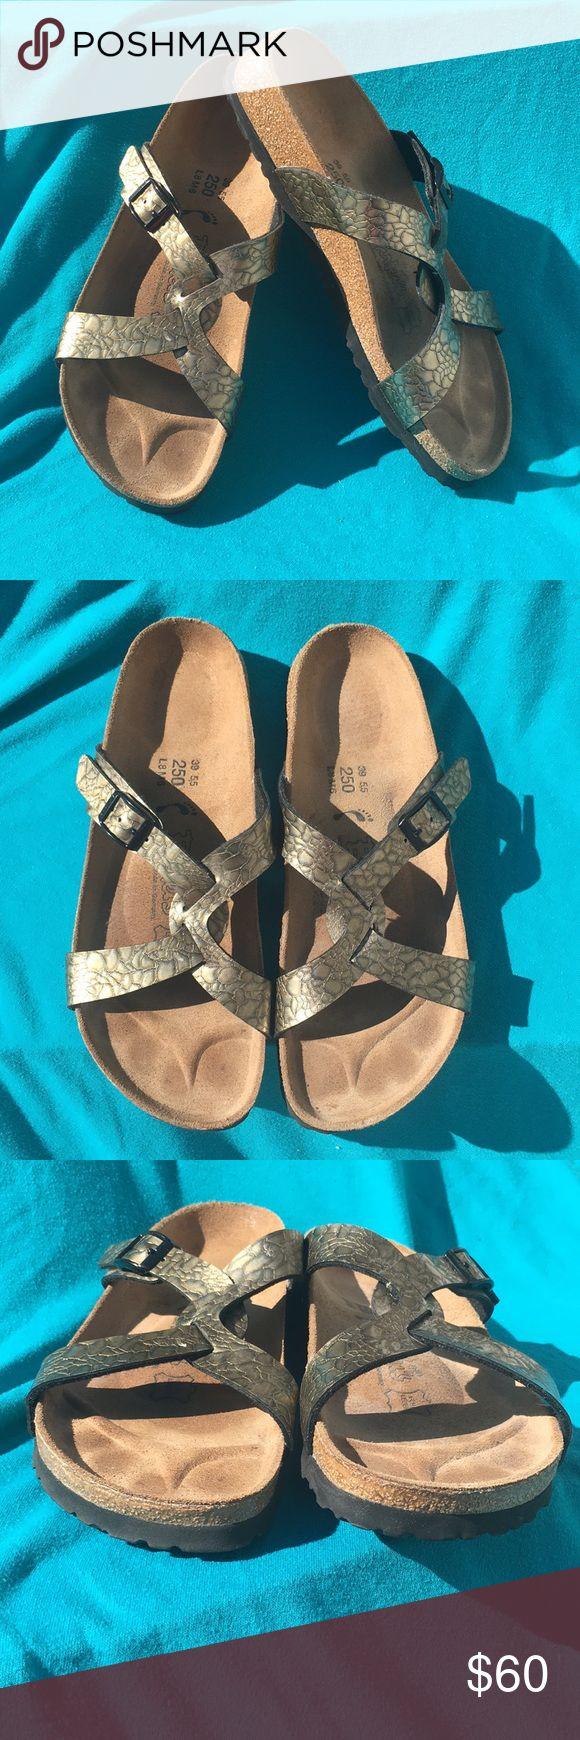 Birkenstock Sandals Ladies size 8 Men's size 6 EUC - Birkenstock Sandals. Gold design on strap. Ladies size 8 men size 6. Fits an 8.0-8.5 by Birkenstock sizing chart (euro size 39 on Birkenstock sizing). Birkenstock Shoes